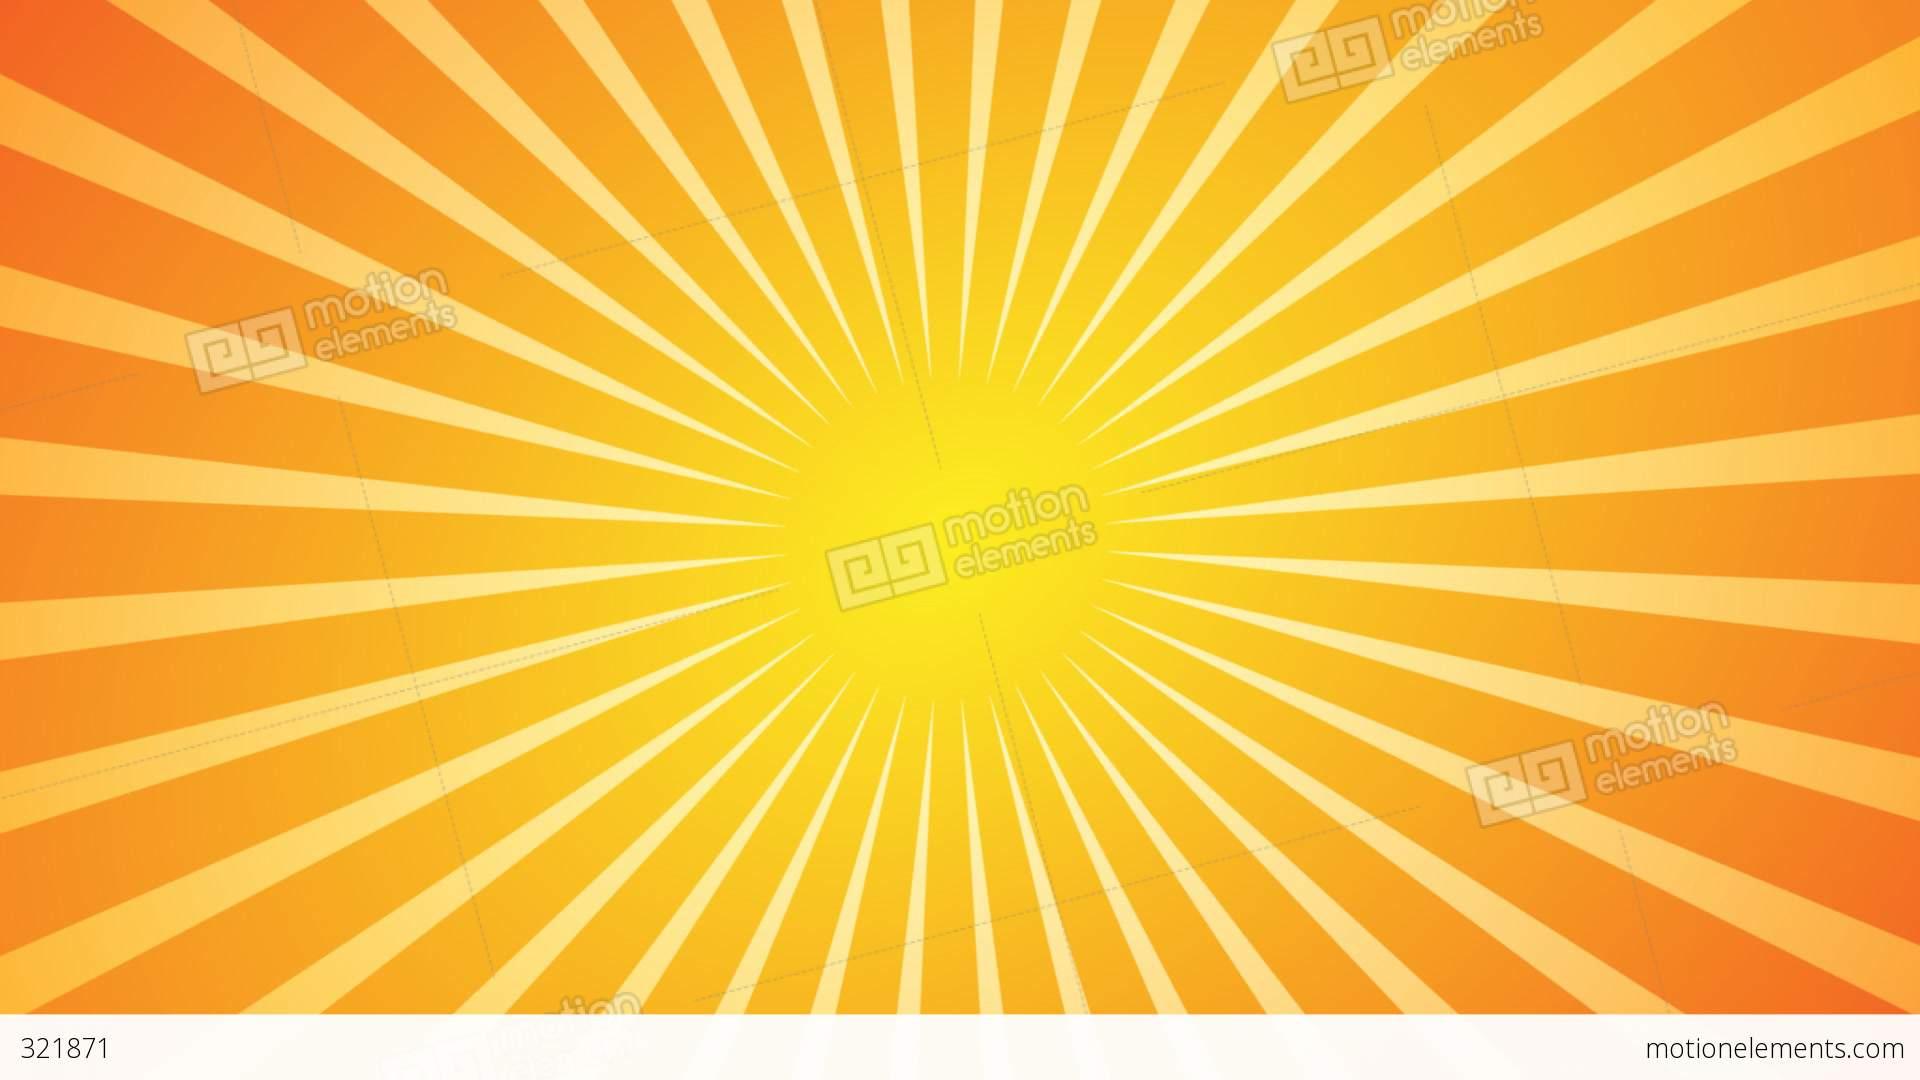 Hd Wallpapers 1080p Nature Animated Hot Sunburst Background Stock Animation 321871